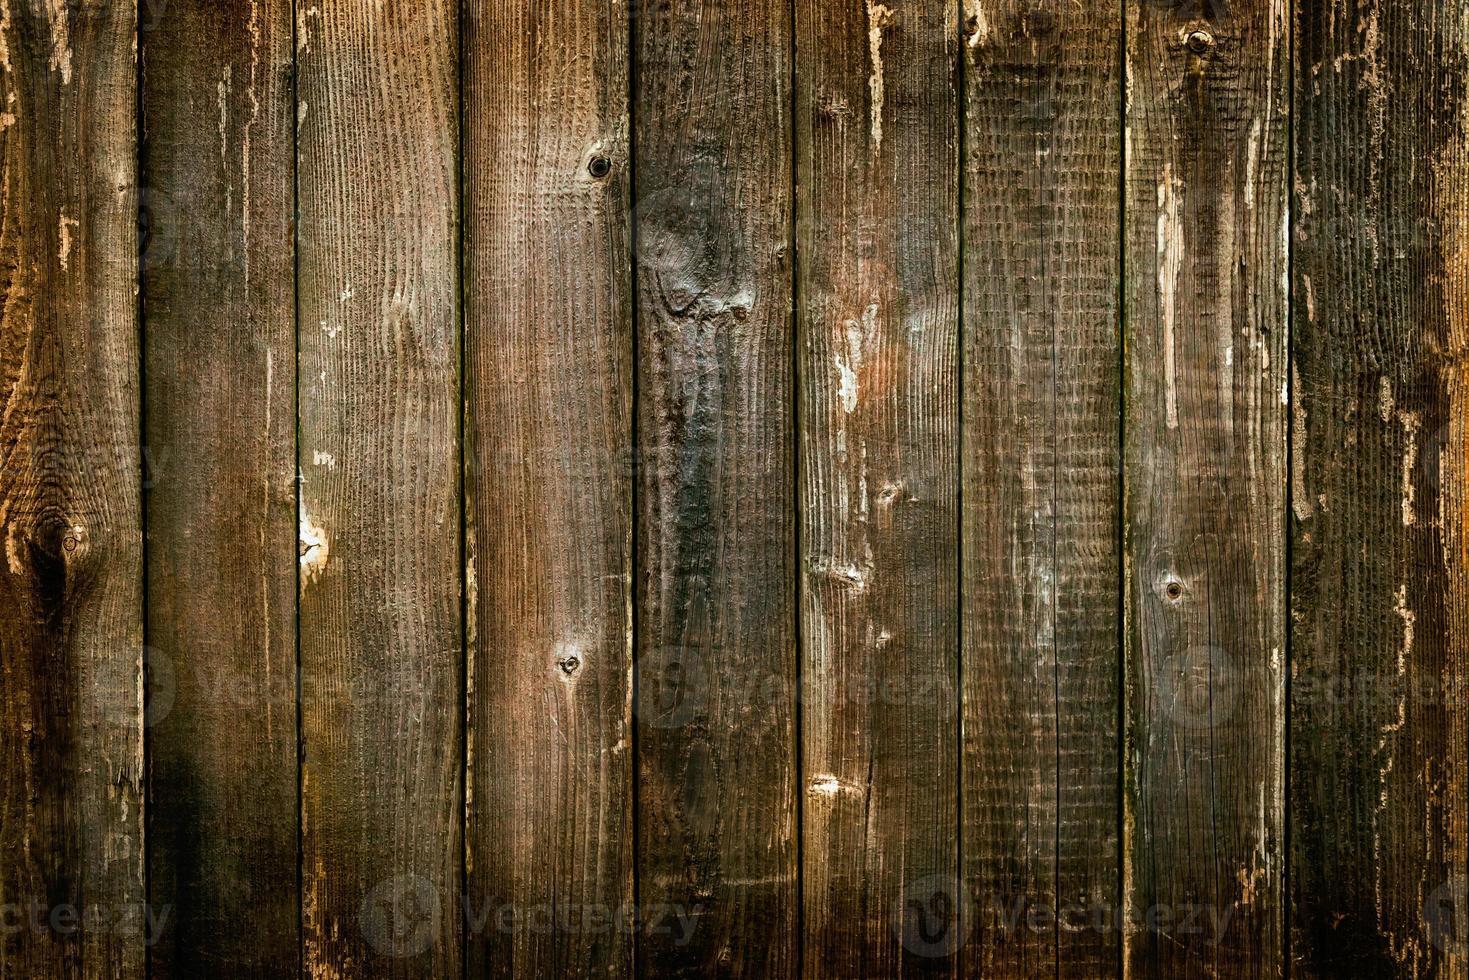 trä antik planka bakgrund textur orange färgad foto